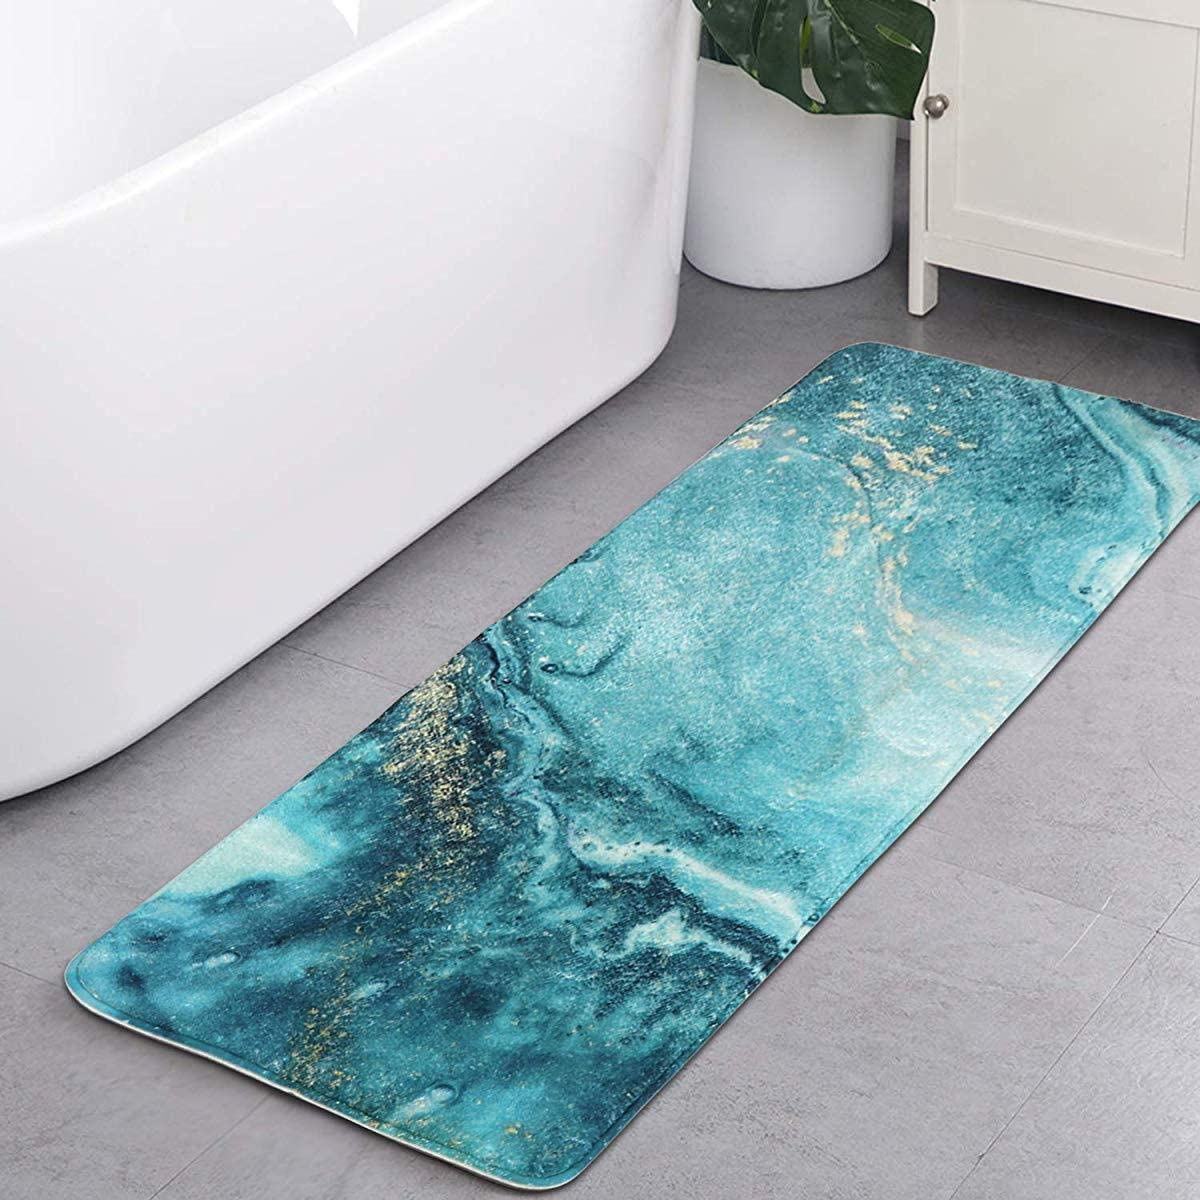 Aincanlx Bath Rug Runner 18x47 inch Turquoise Marble Bathroom Mat Non-Slip Long Shag Carpet Soft Luxury Microfiber Machine-Washable Floor Kitchen Throw Rug for Doormats Tub Shower